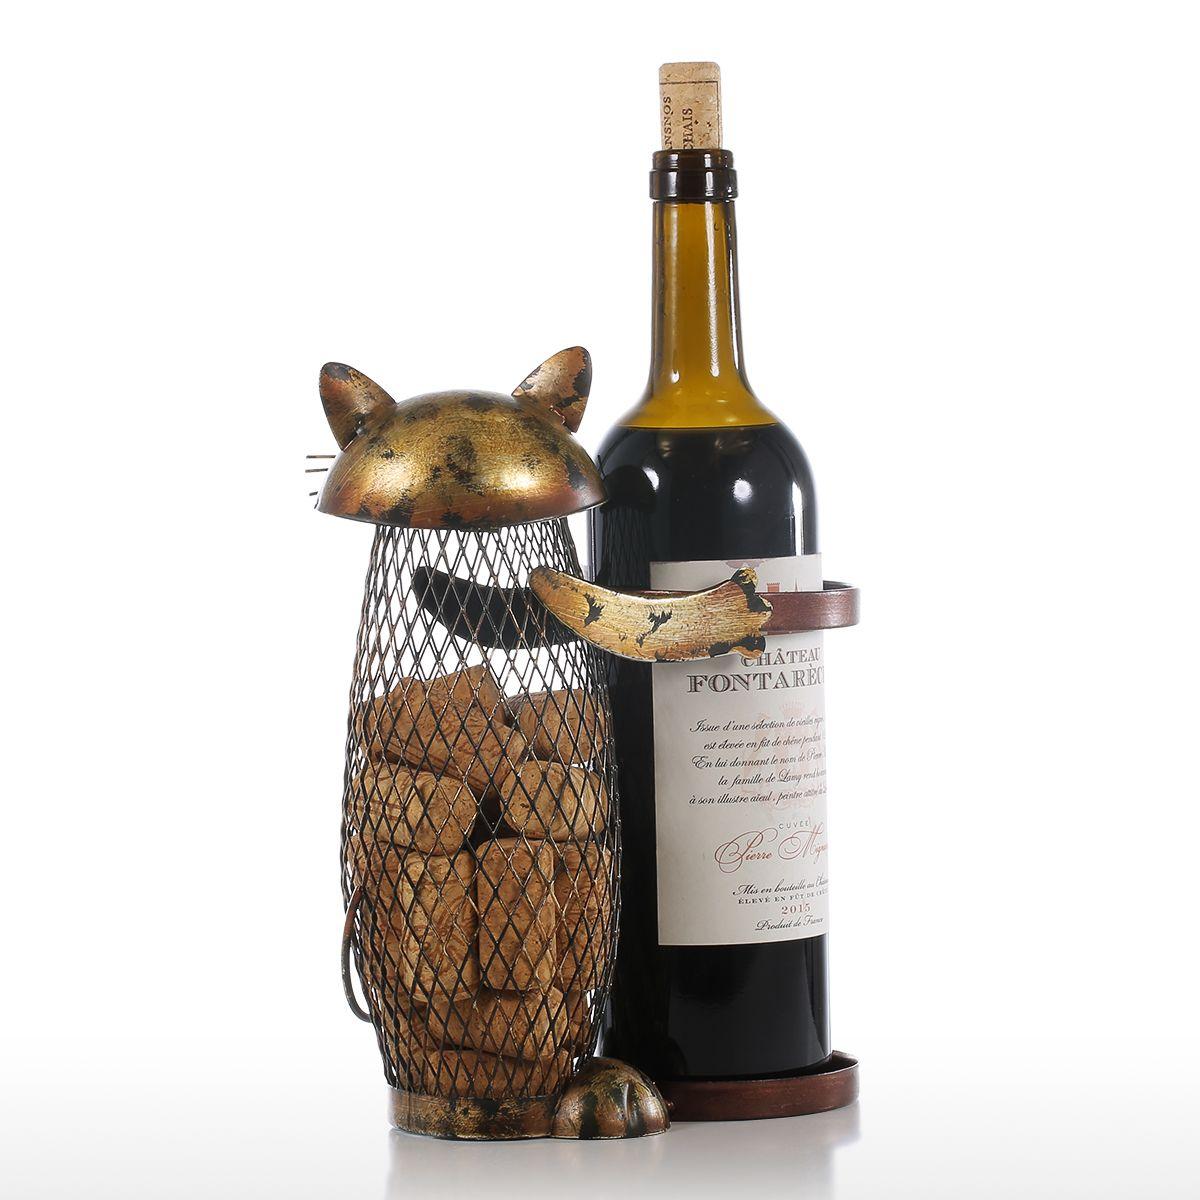 Tooarts Cat Wine Rack Cork Container Bottle Wine Holder Kitchen Bar Metal Wine Craft Christmas Gift Handcraft Animal Wine Stand 12